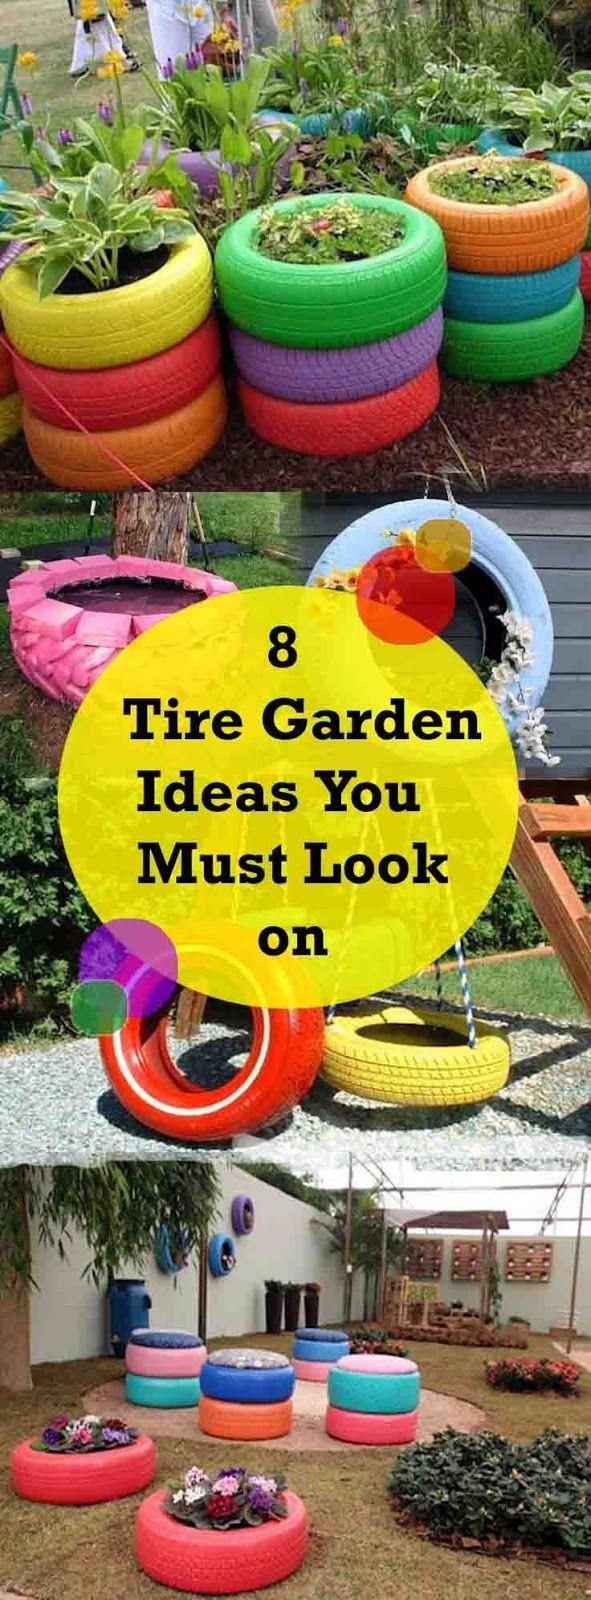 DIY ideas using tires in your garden